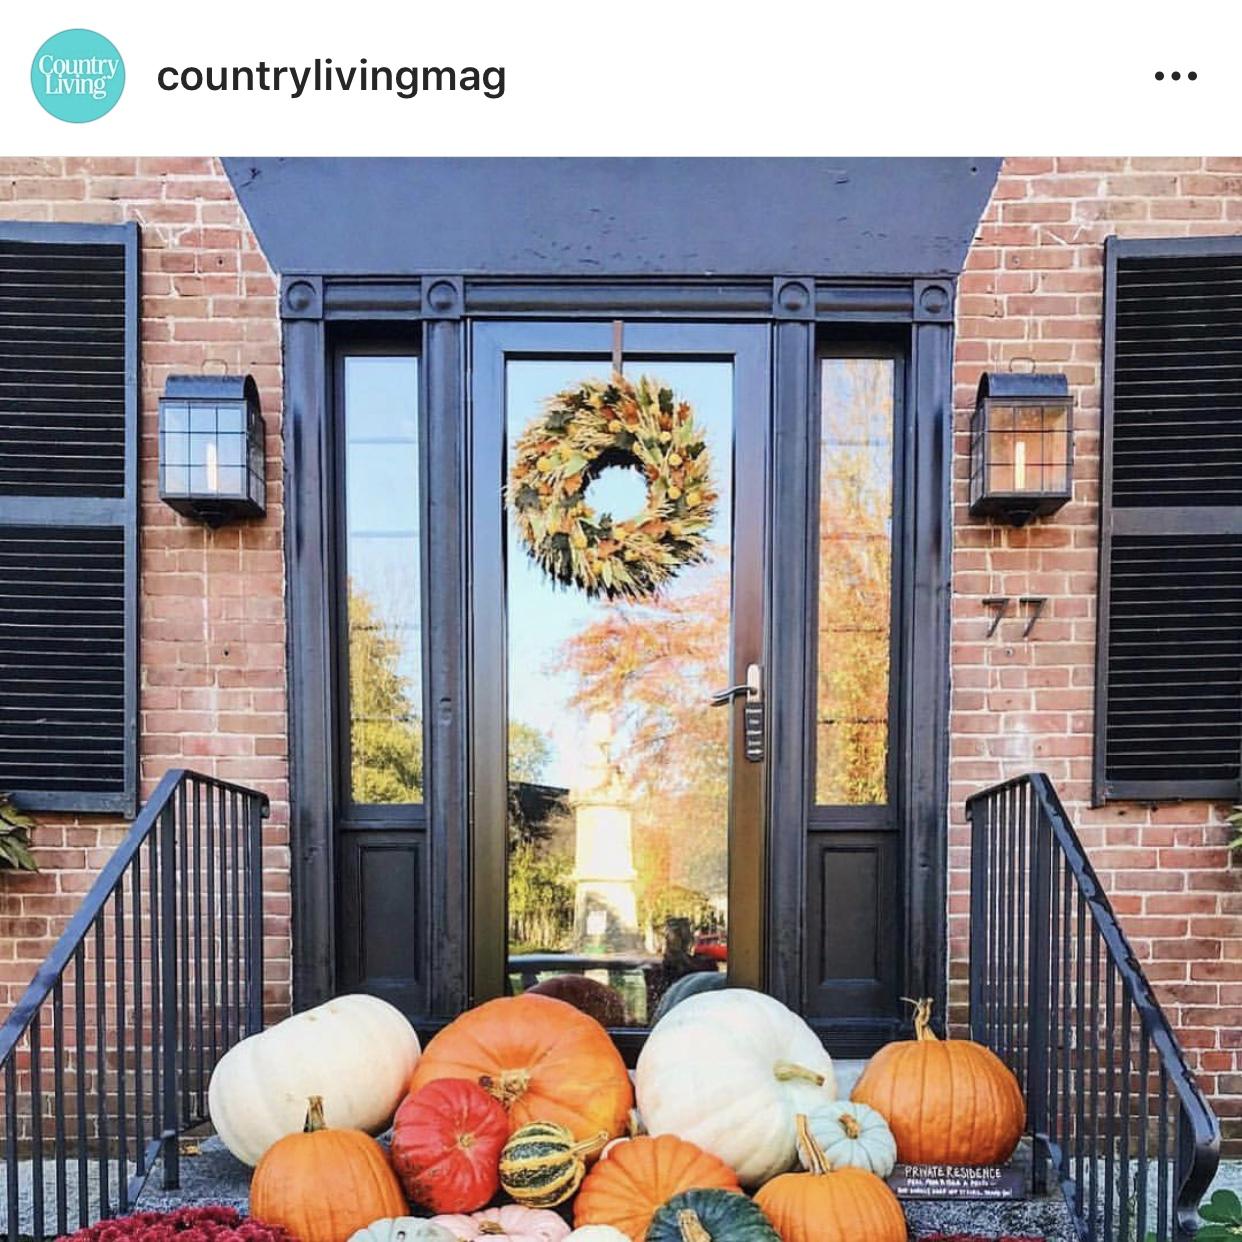 @countrylivingmag' -